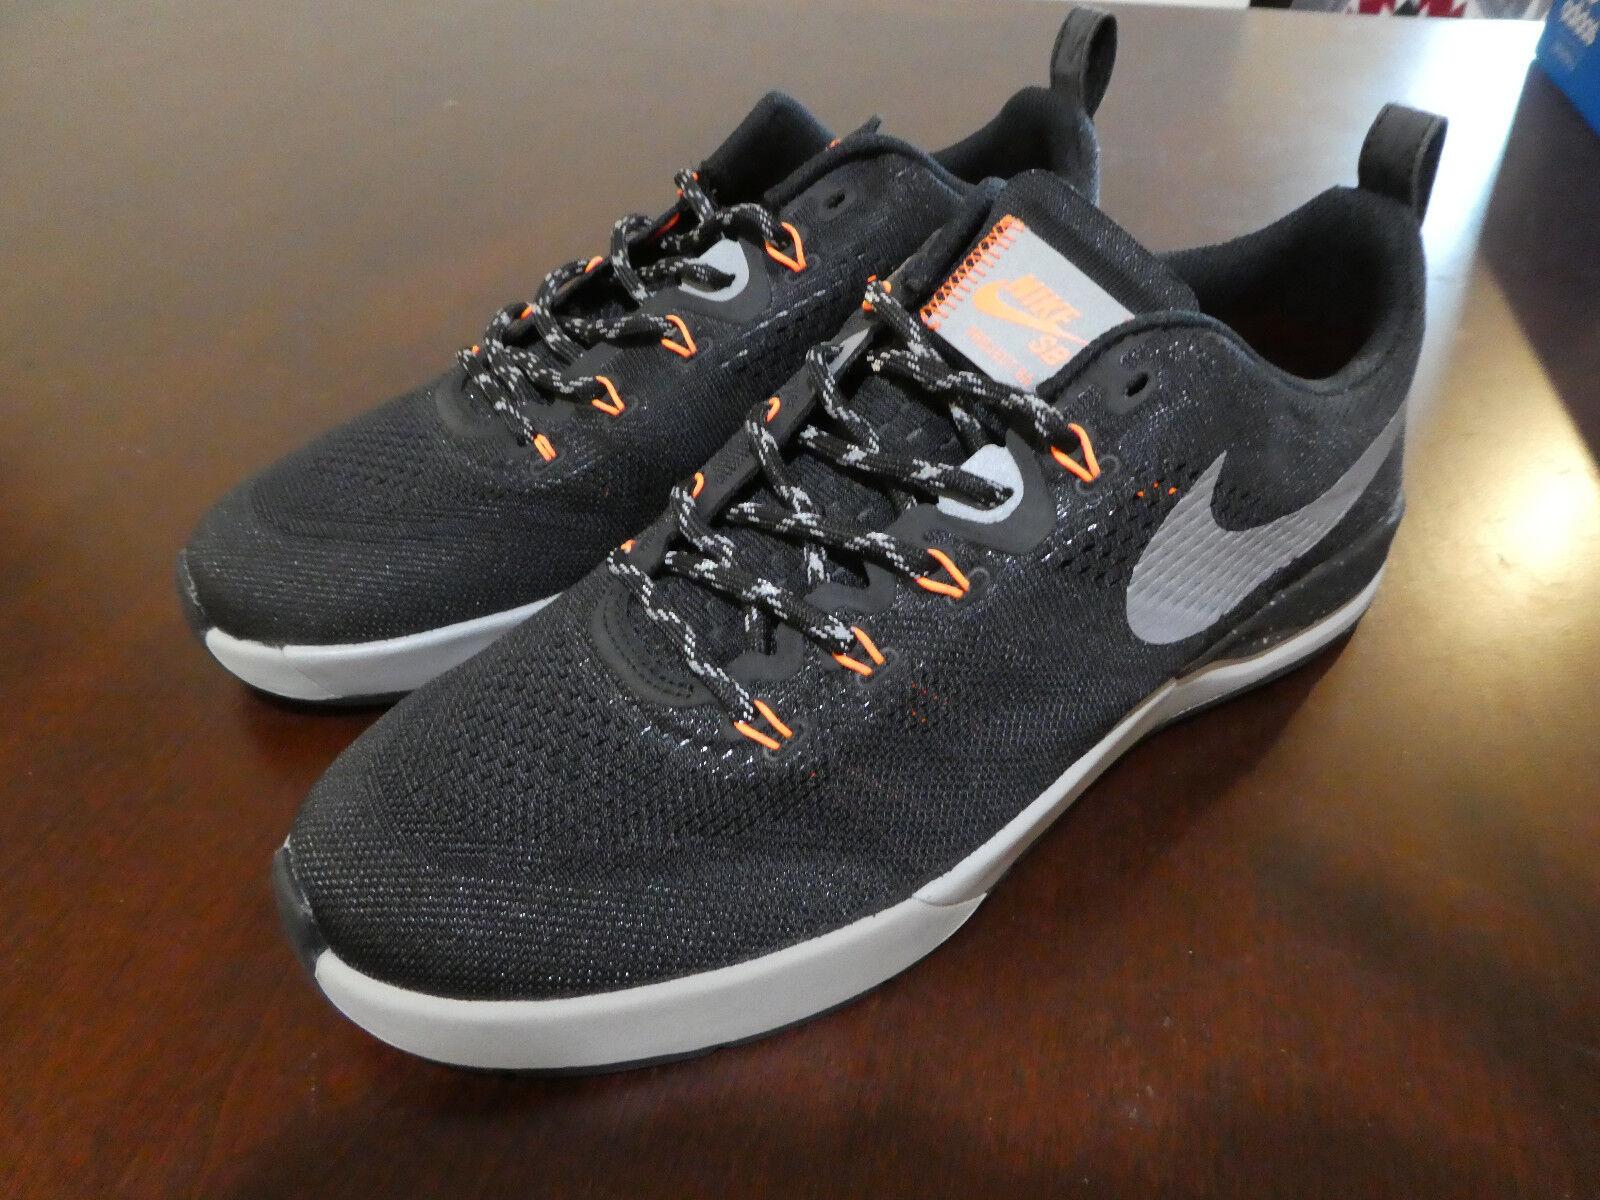 Nike SB Skate Project BA R/R Shield shoes new lunarlon black sneakers skateboard